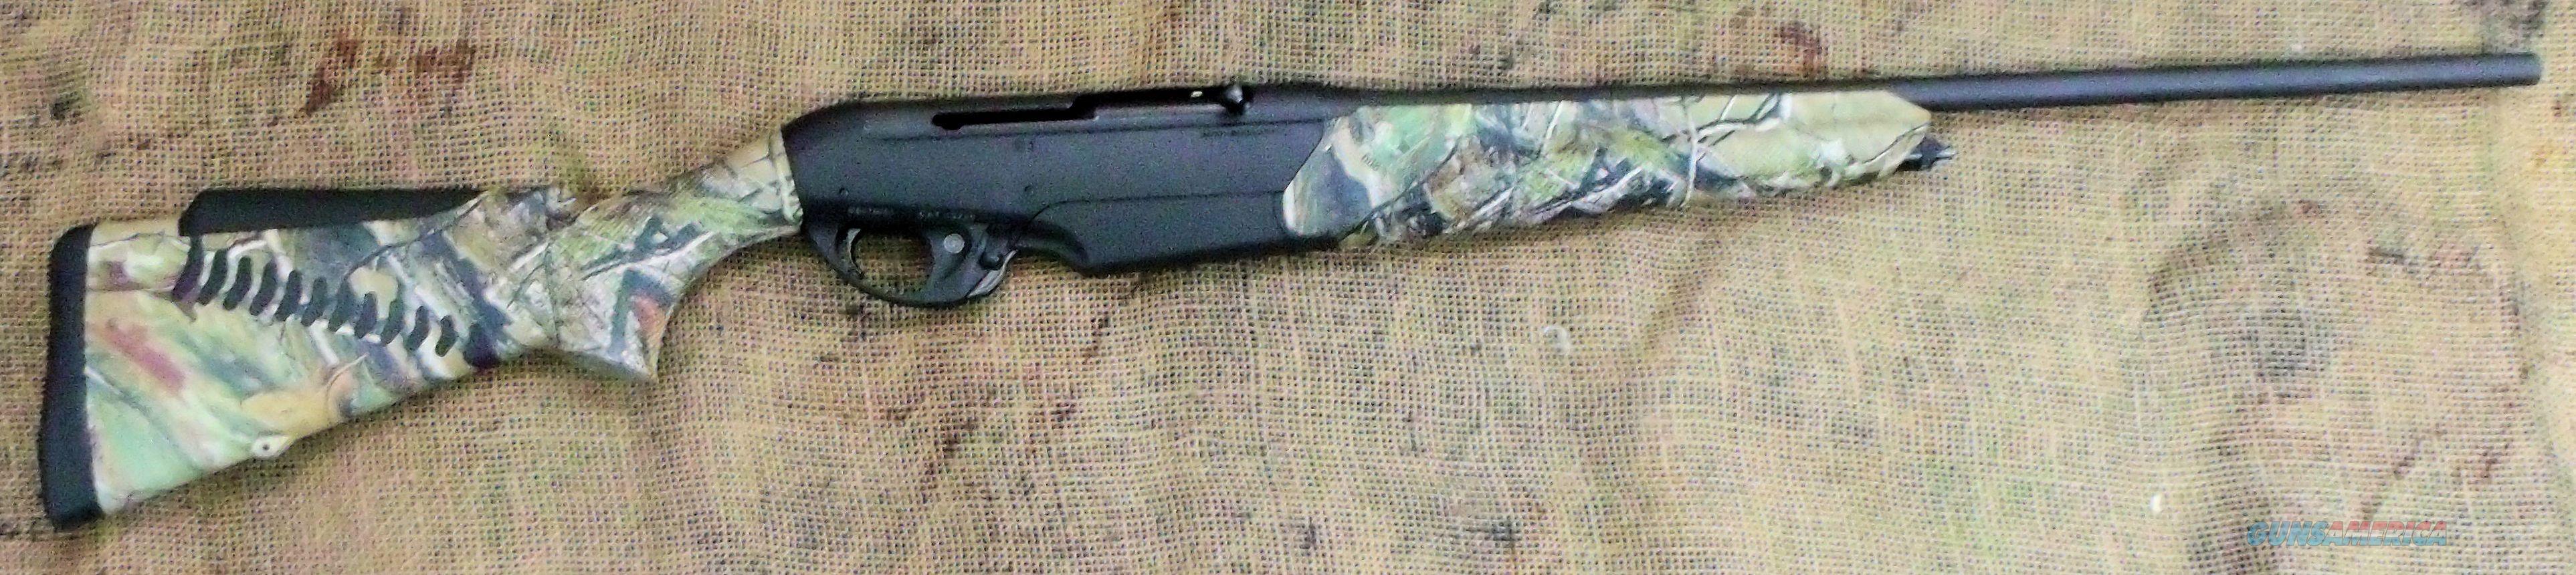 BENELLI Model R-1 Argo Semi-Auto Rifle, 30-06 Cal.  Guns > Rifles > Benelli Rifles